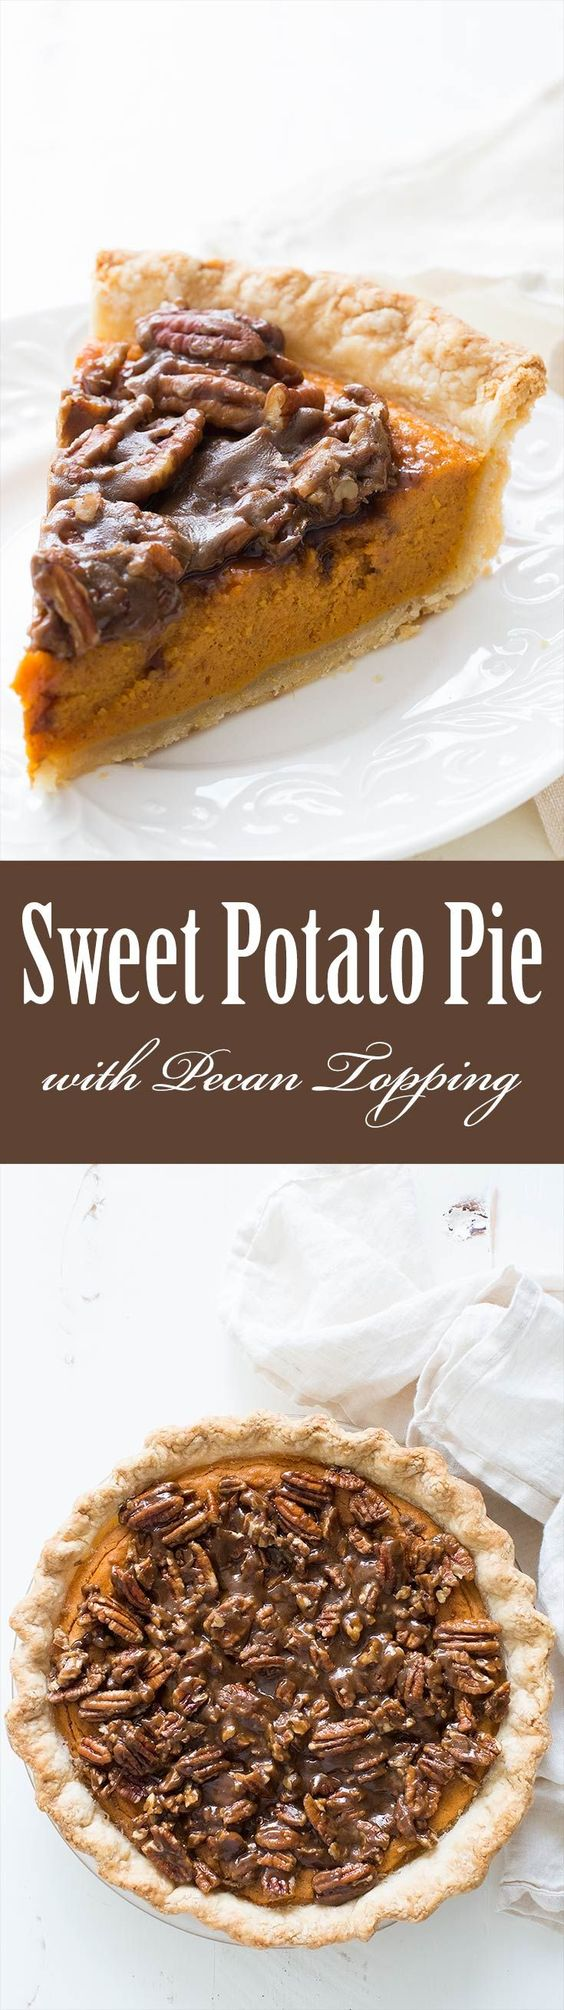 Sweet potato pies, Potato pie and Pecans on Pinterest